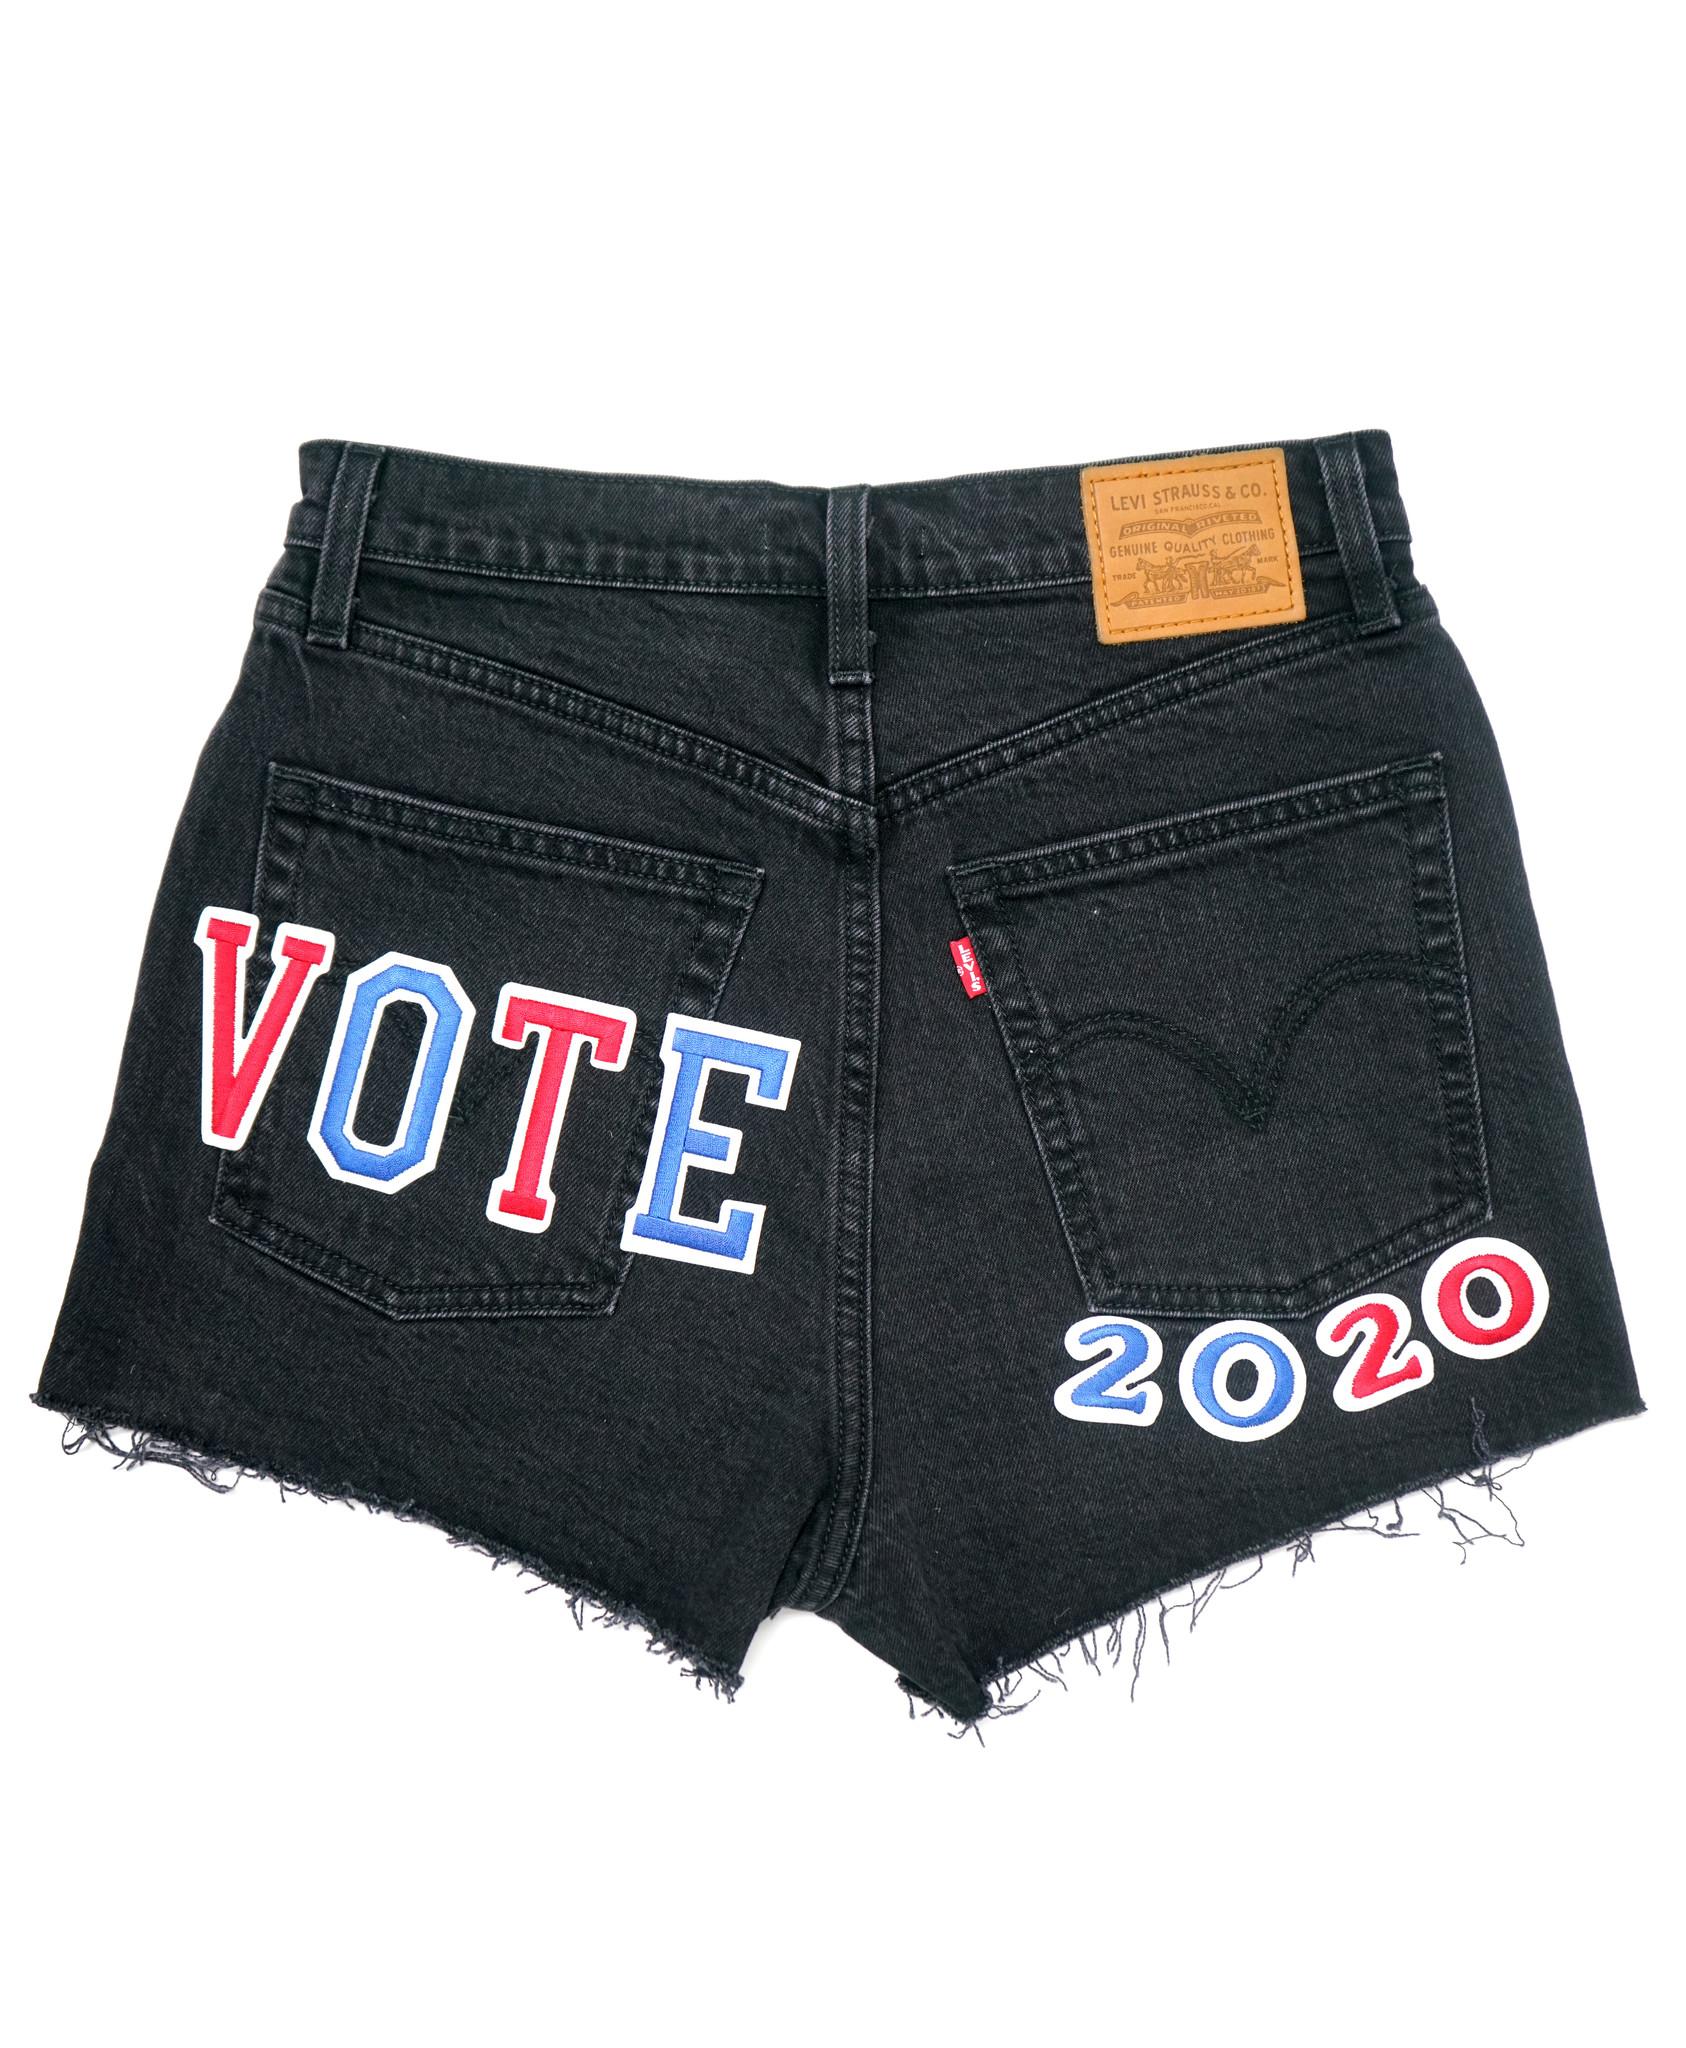 LEVI'S  VOTE RIBCAGE SHORTS 77879-0052 BLACK BAYOU-3